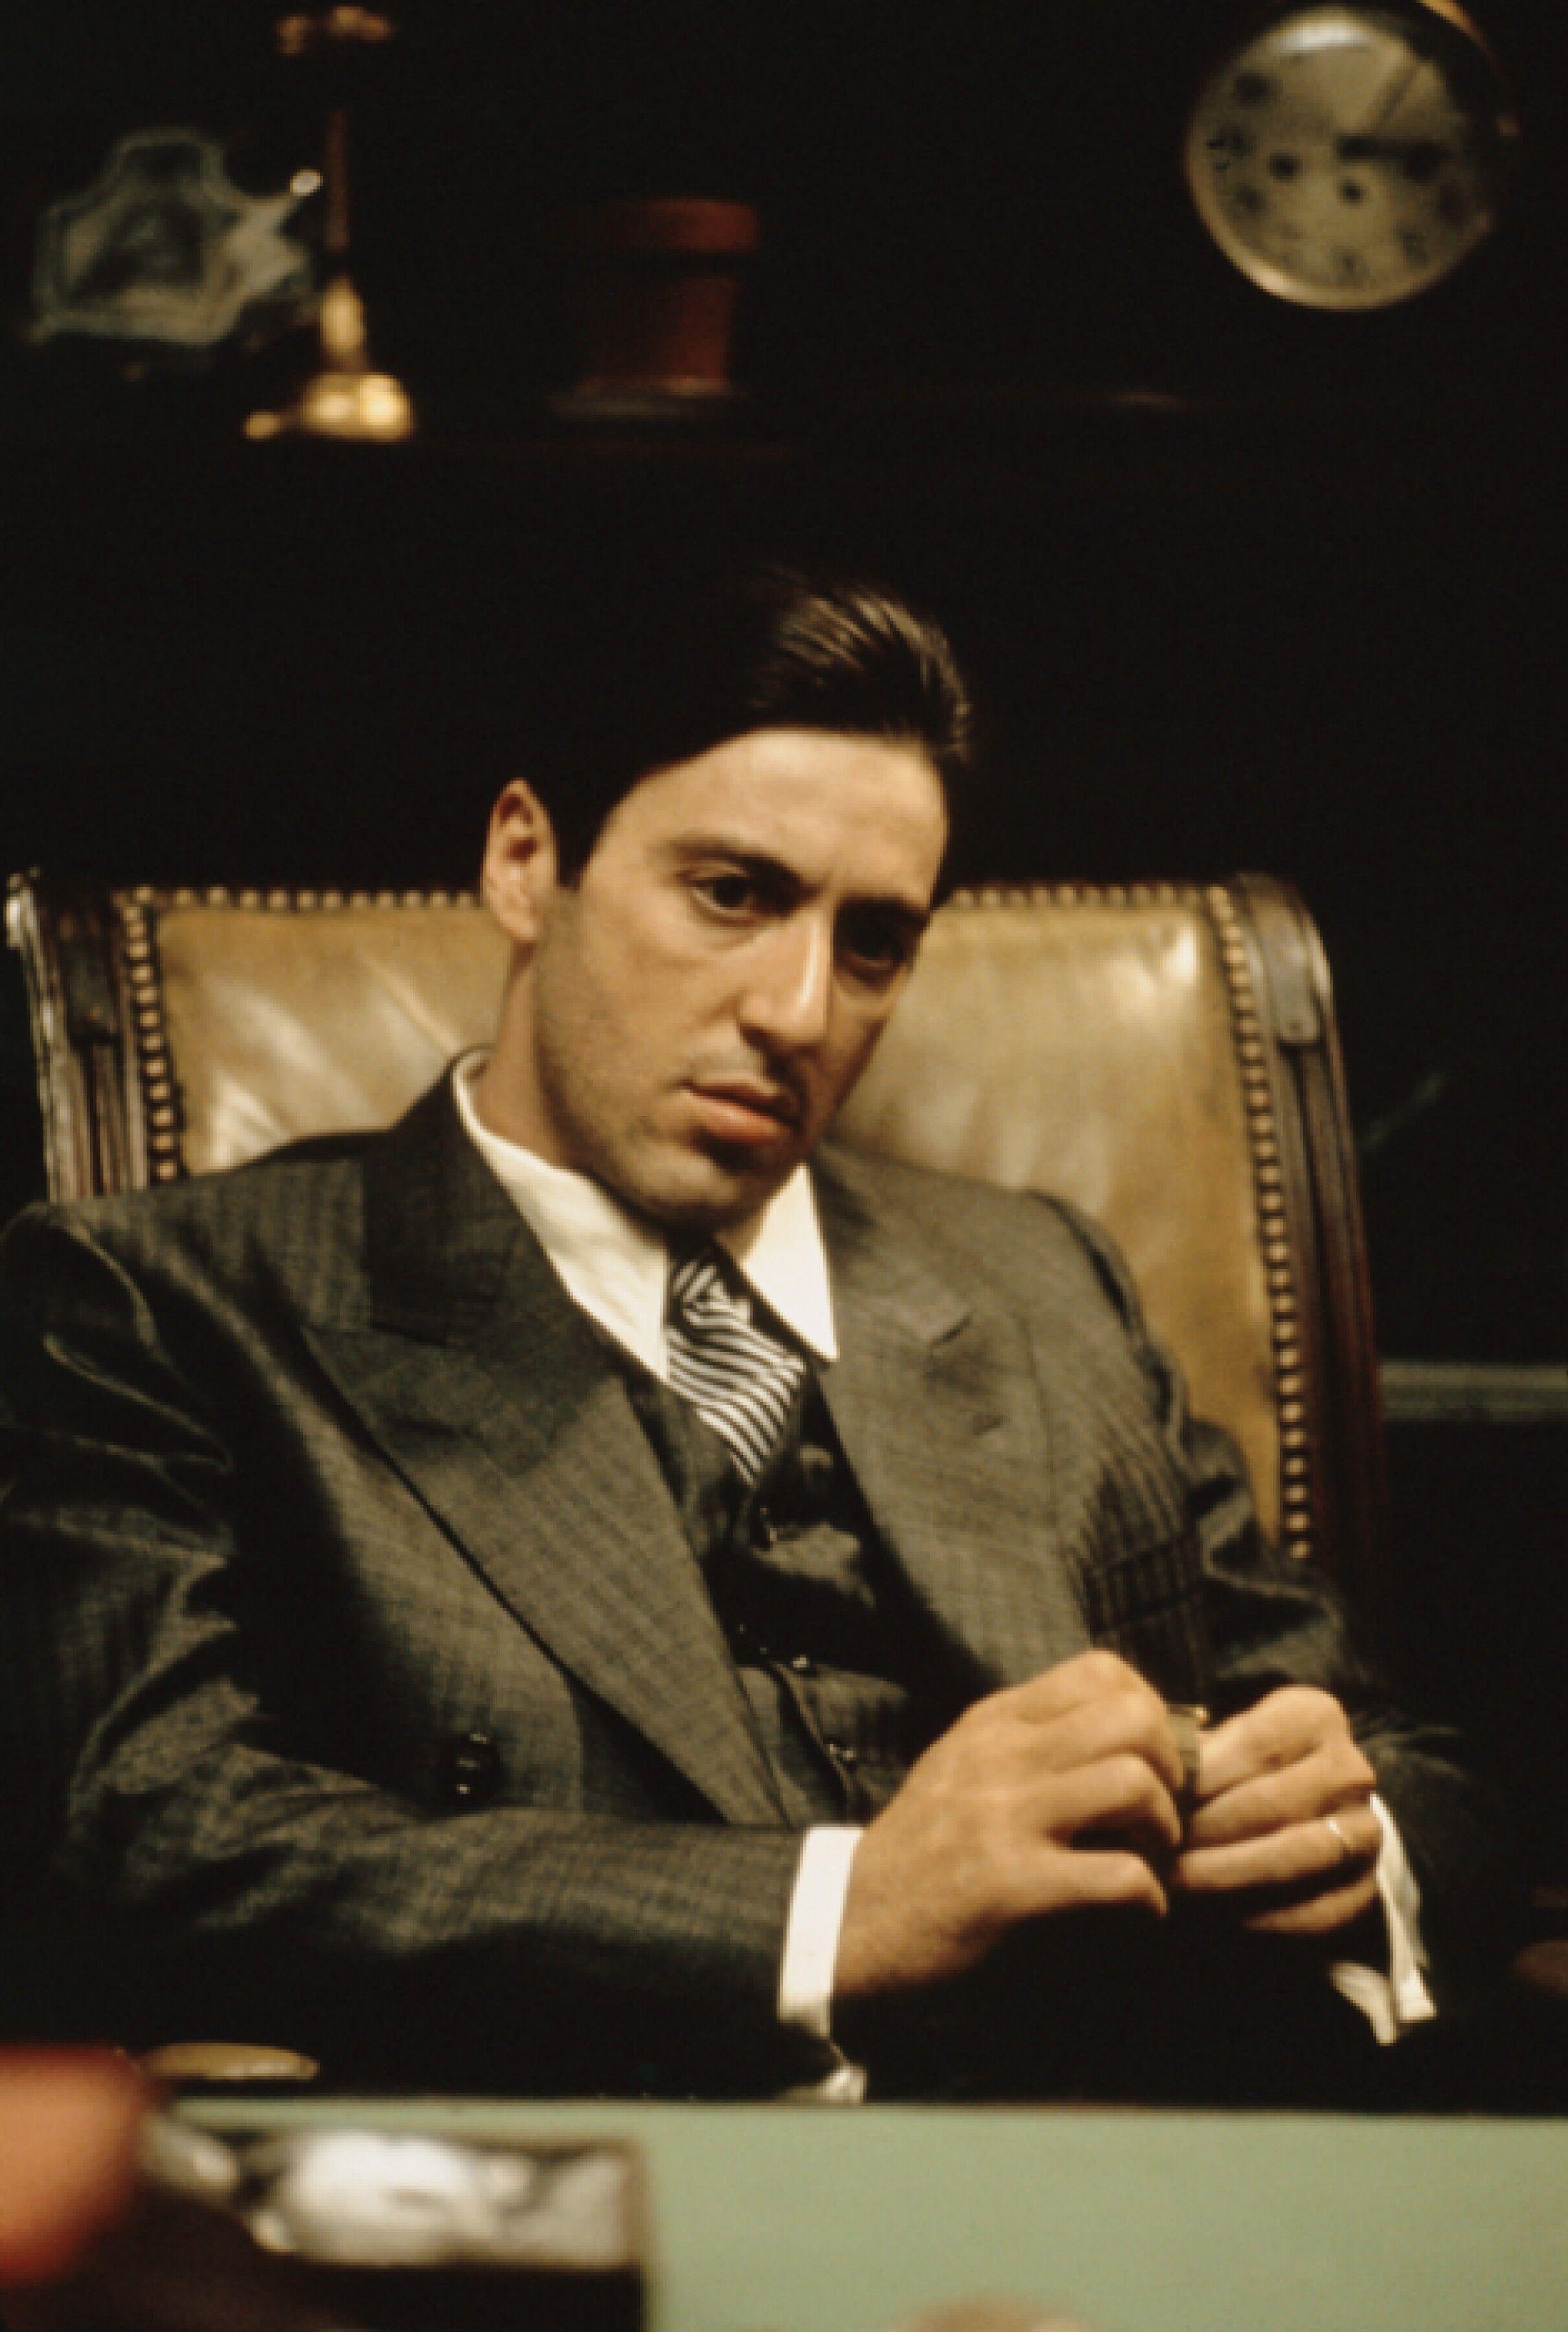 Godfather Movie - HD Wallpaper